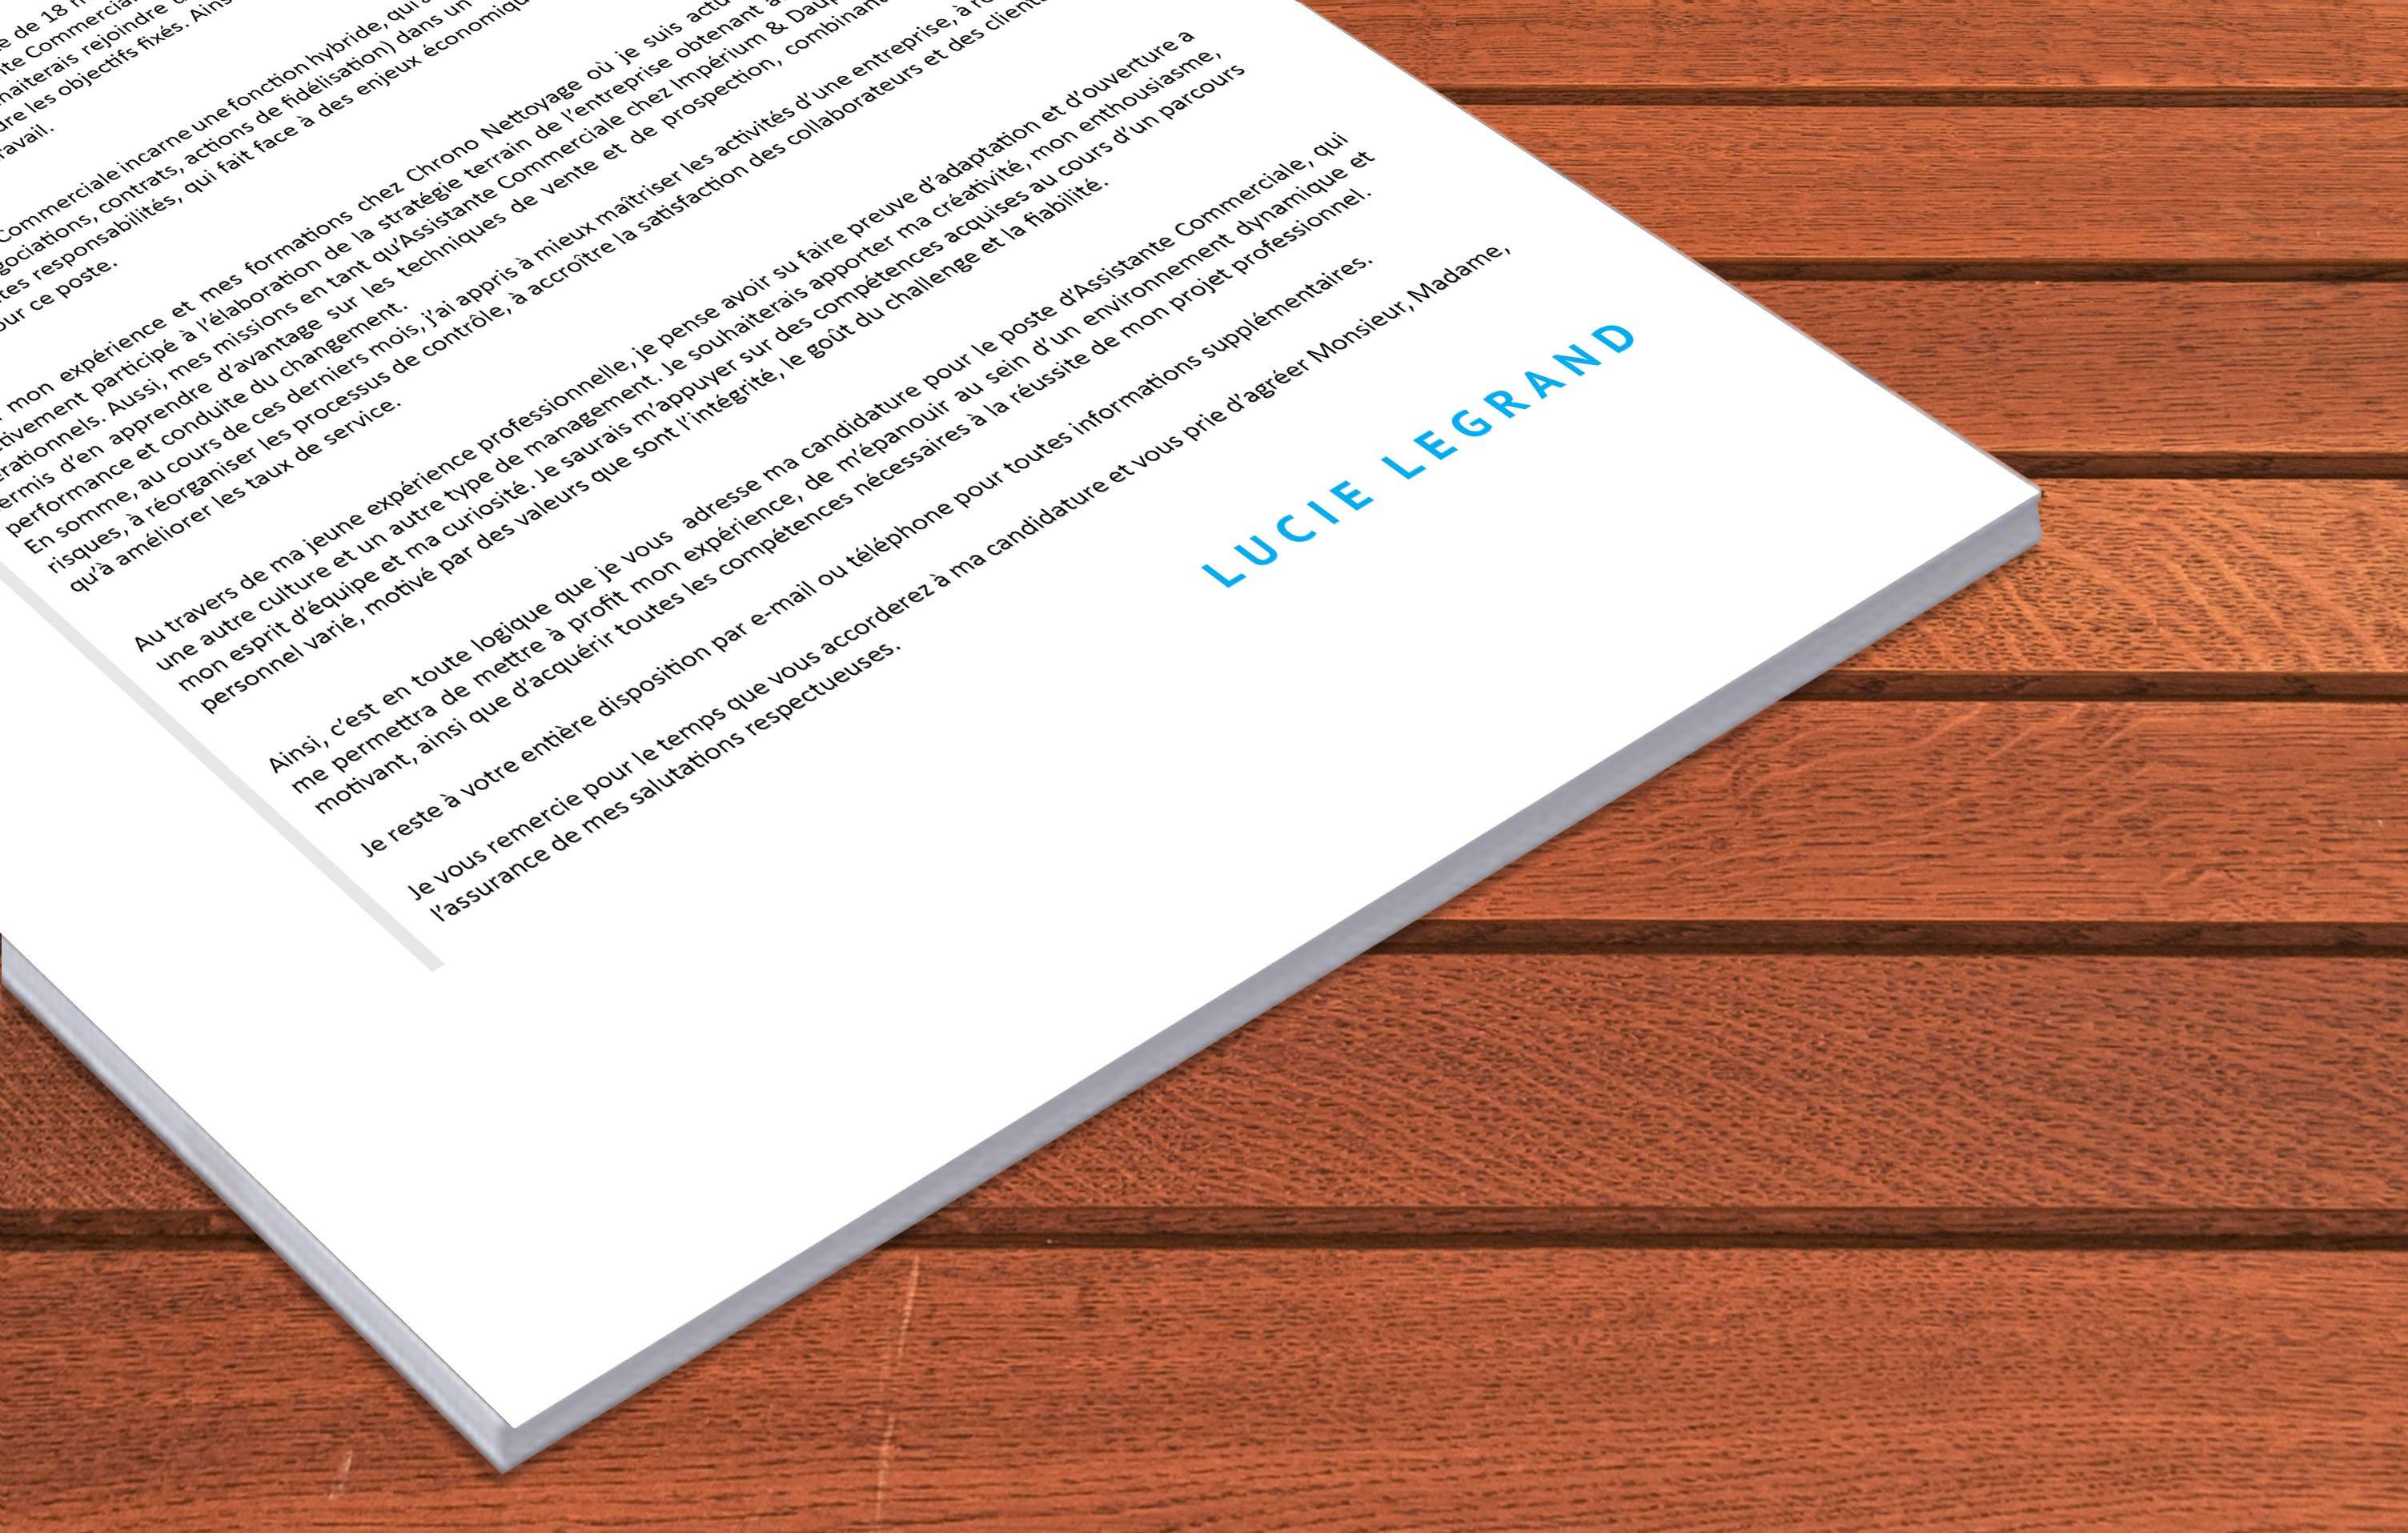 mycvfactory-cover-letter-l-azur-2_ALAQsdF.jpg